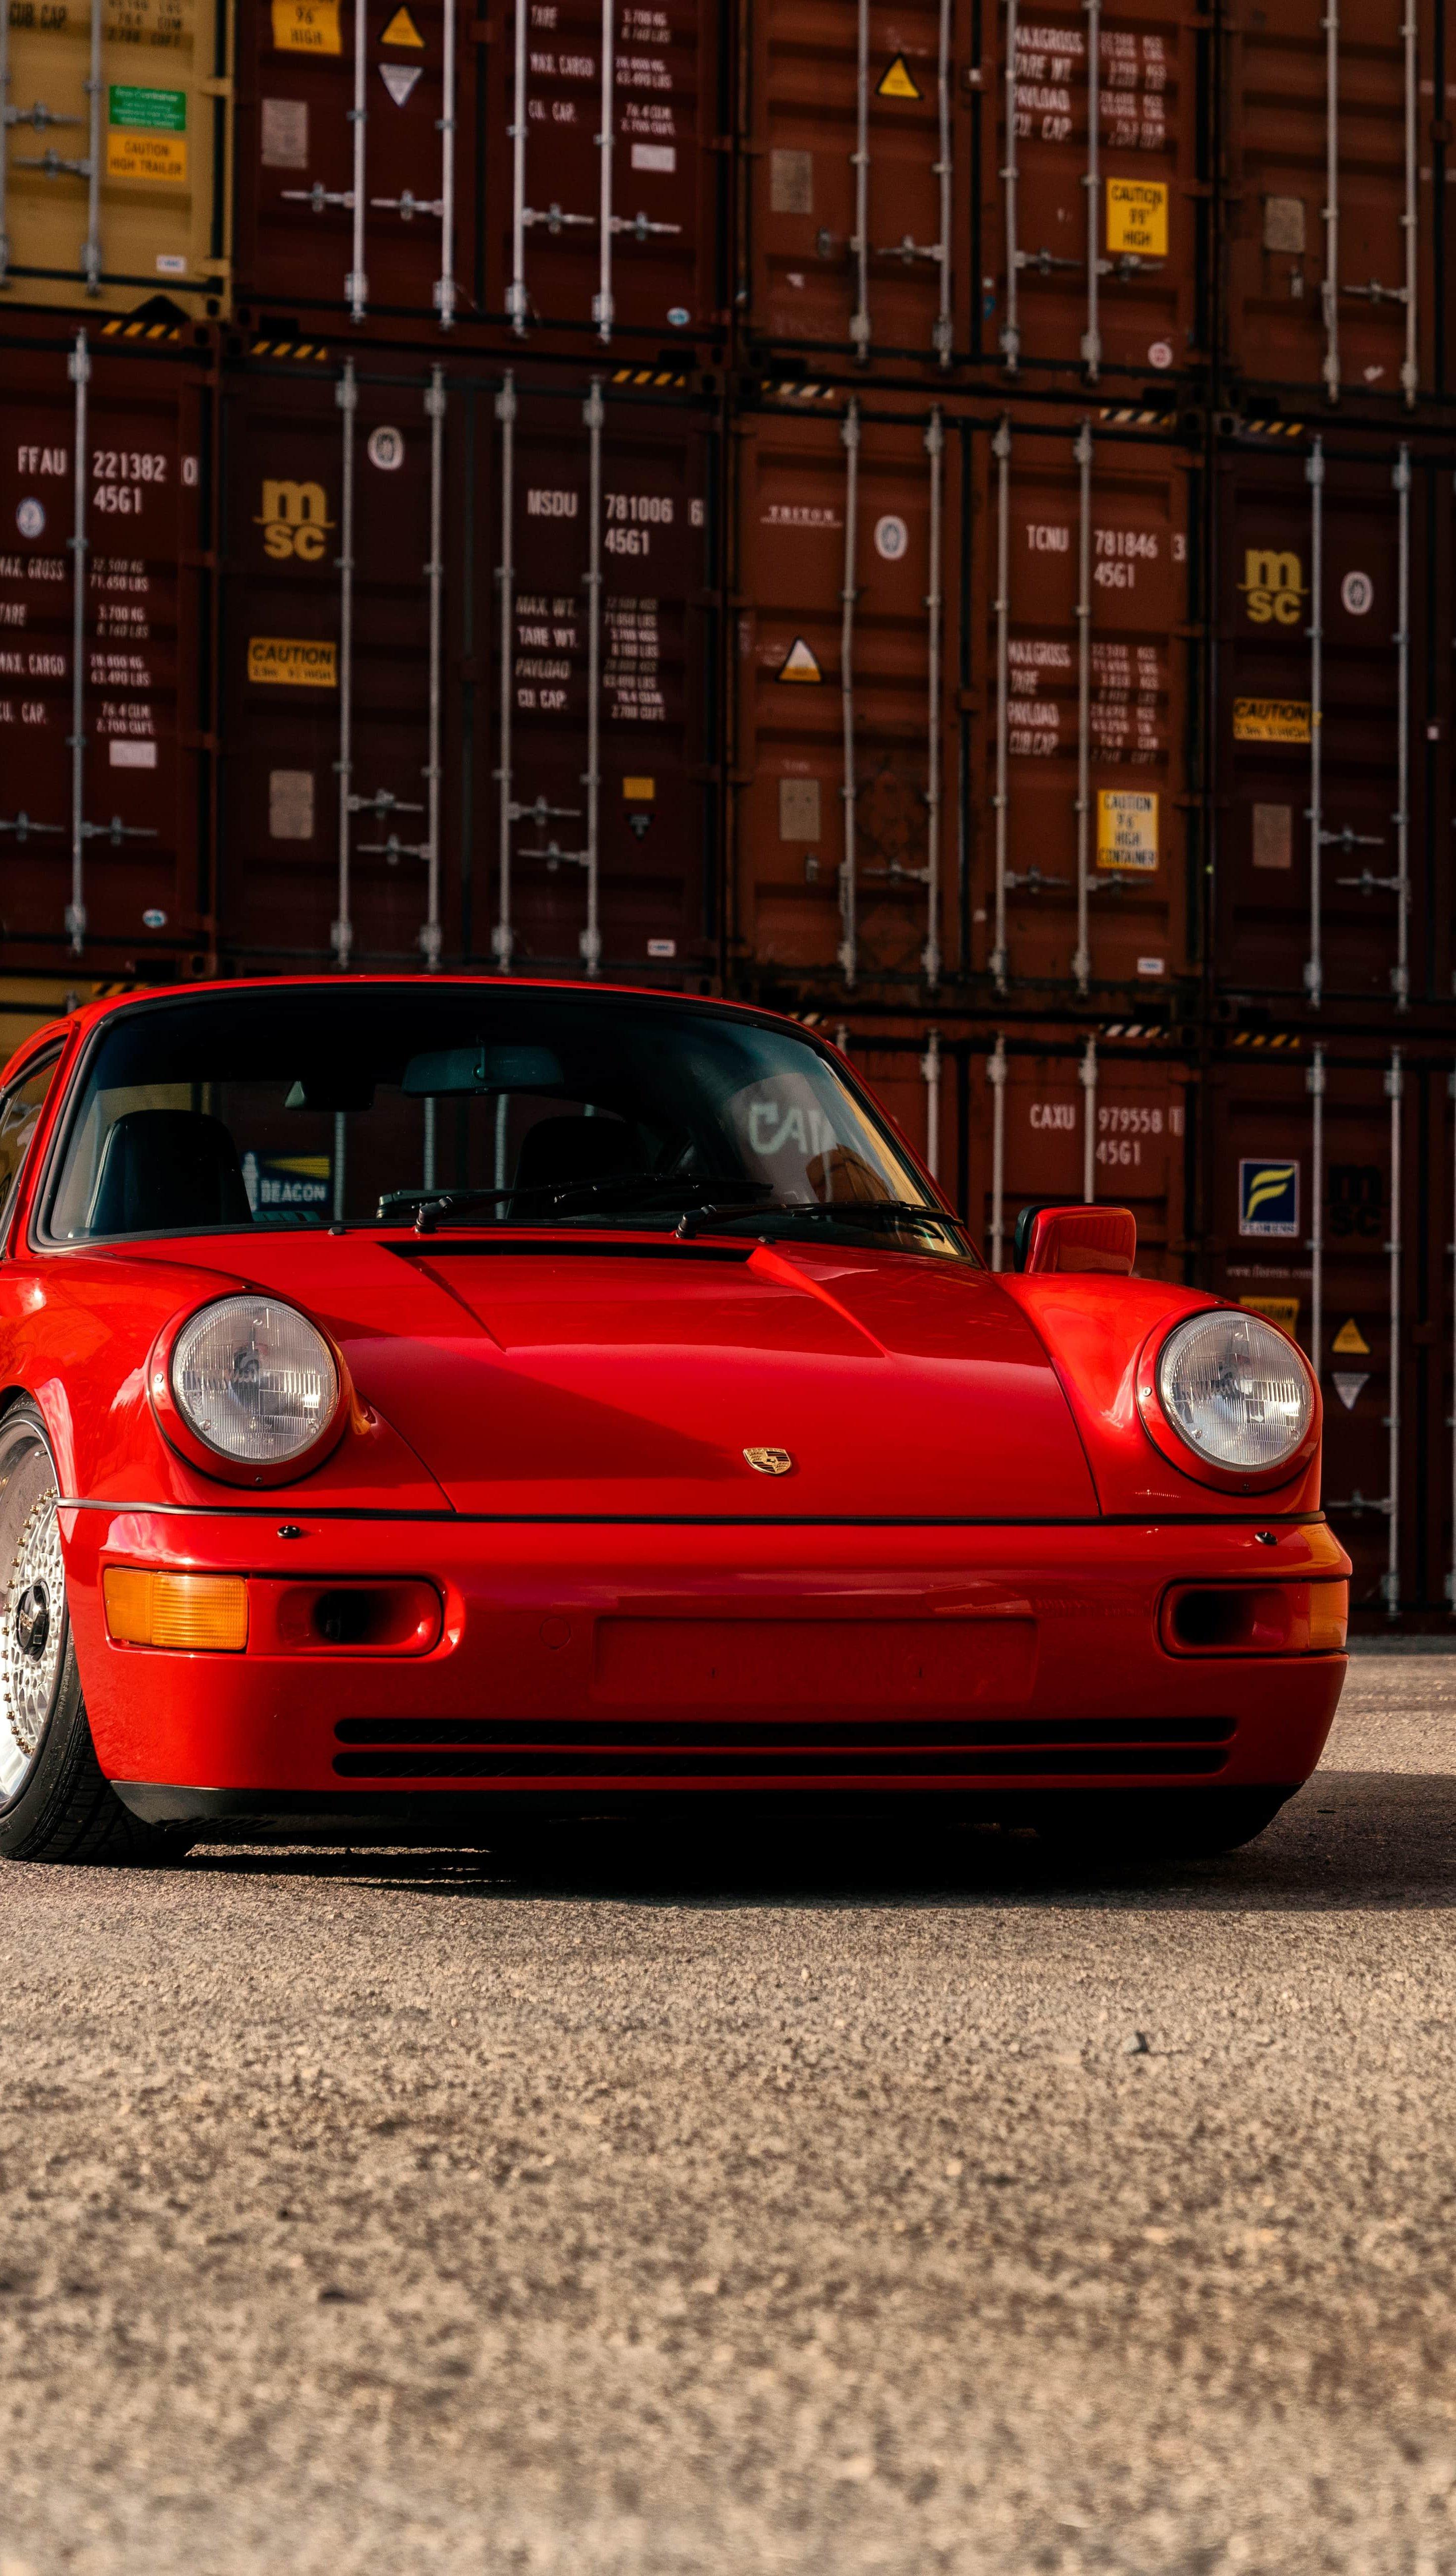 Wallpaper Taco Red Porsche Vertical